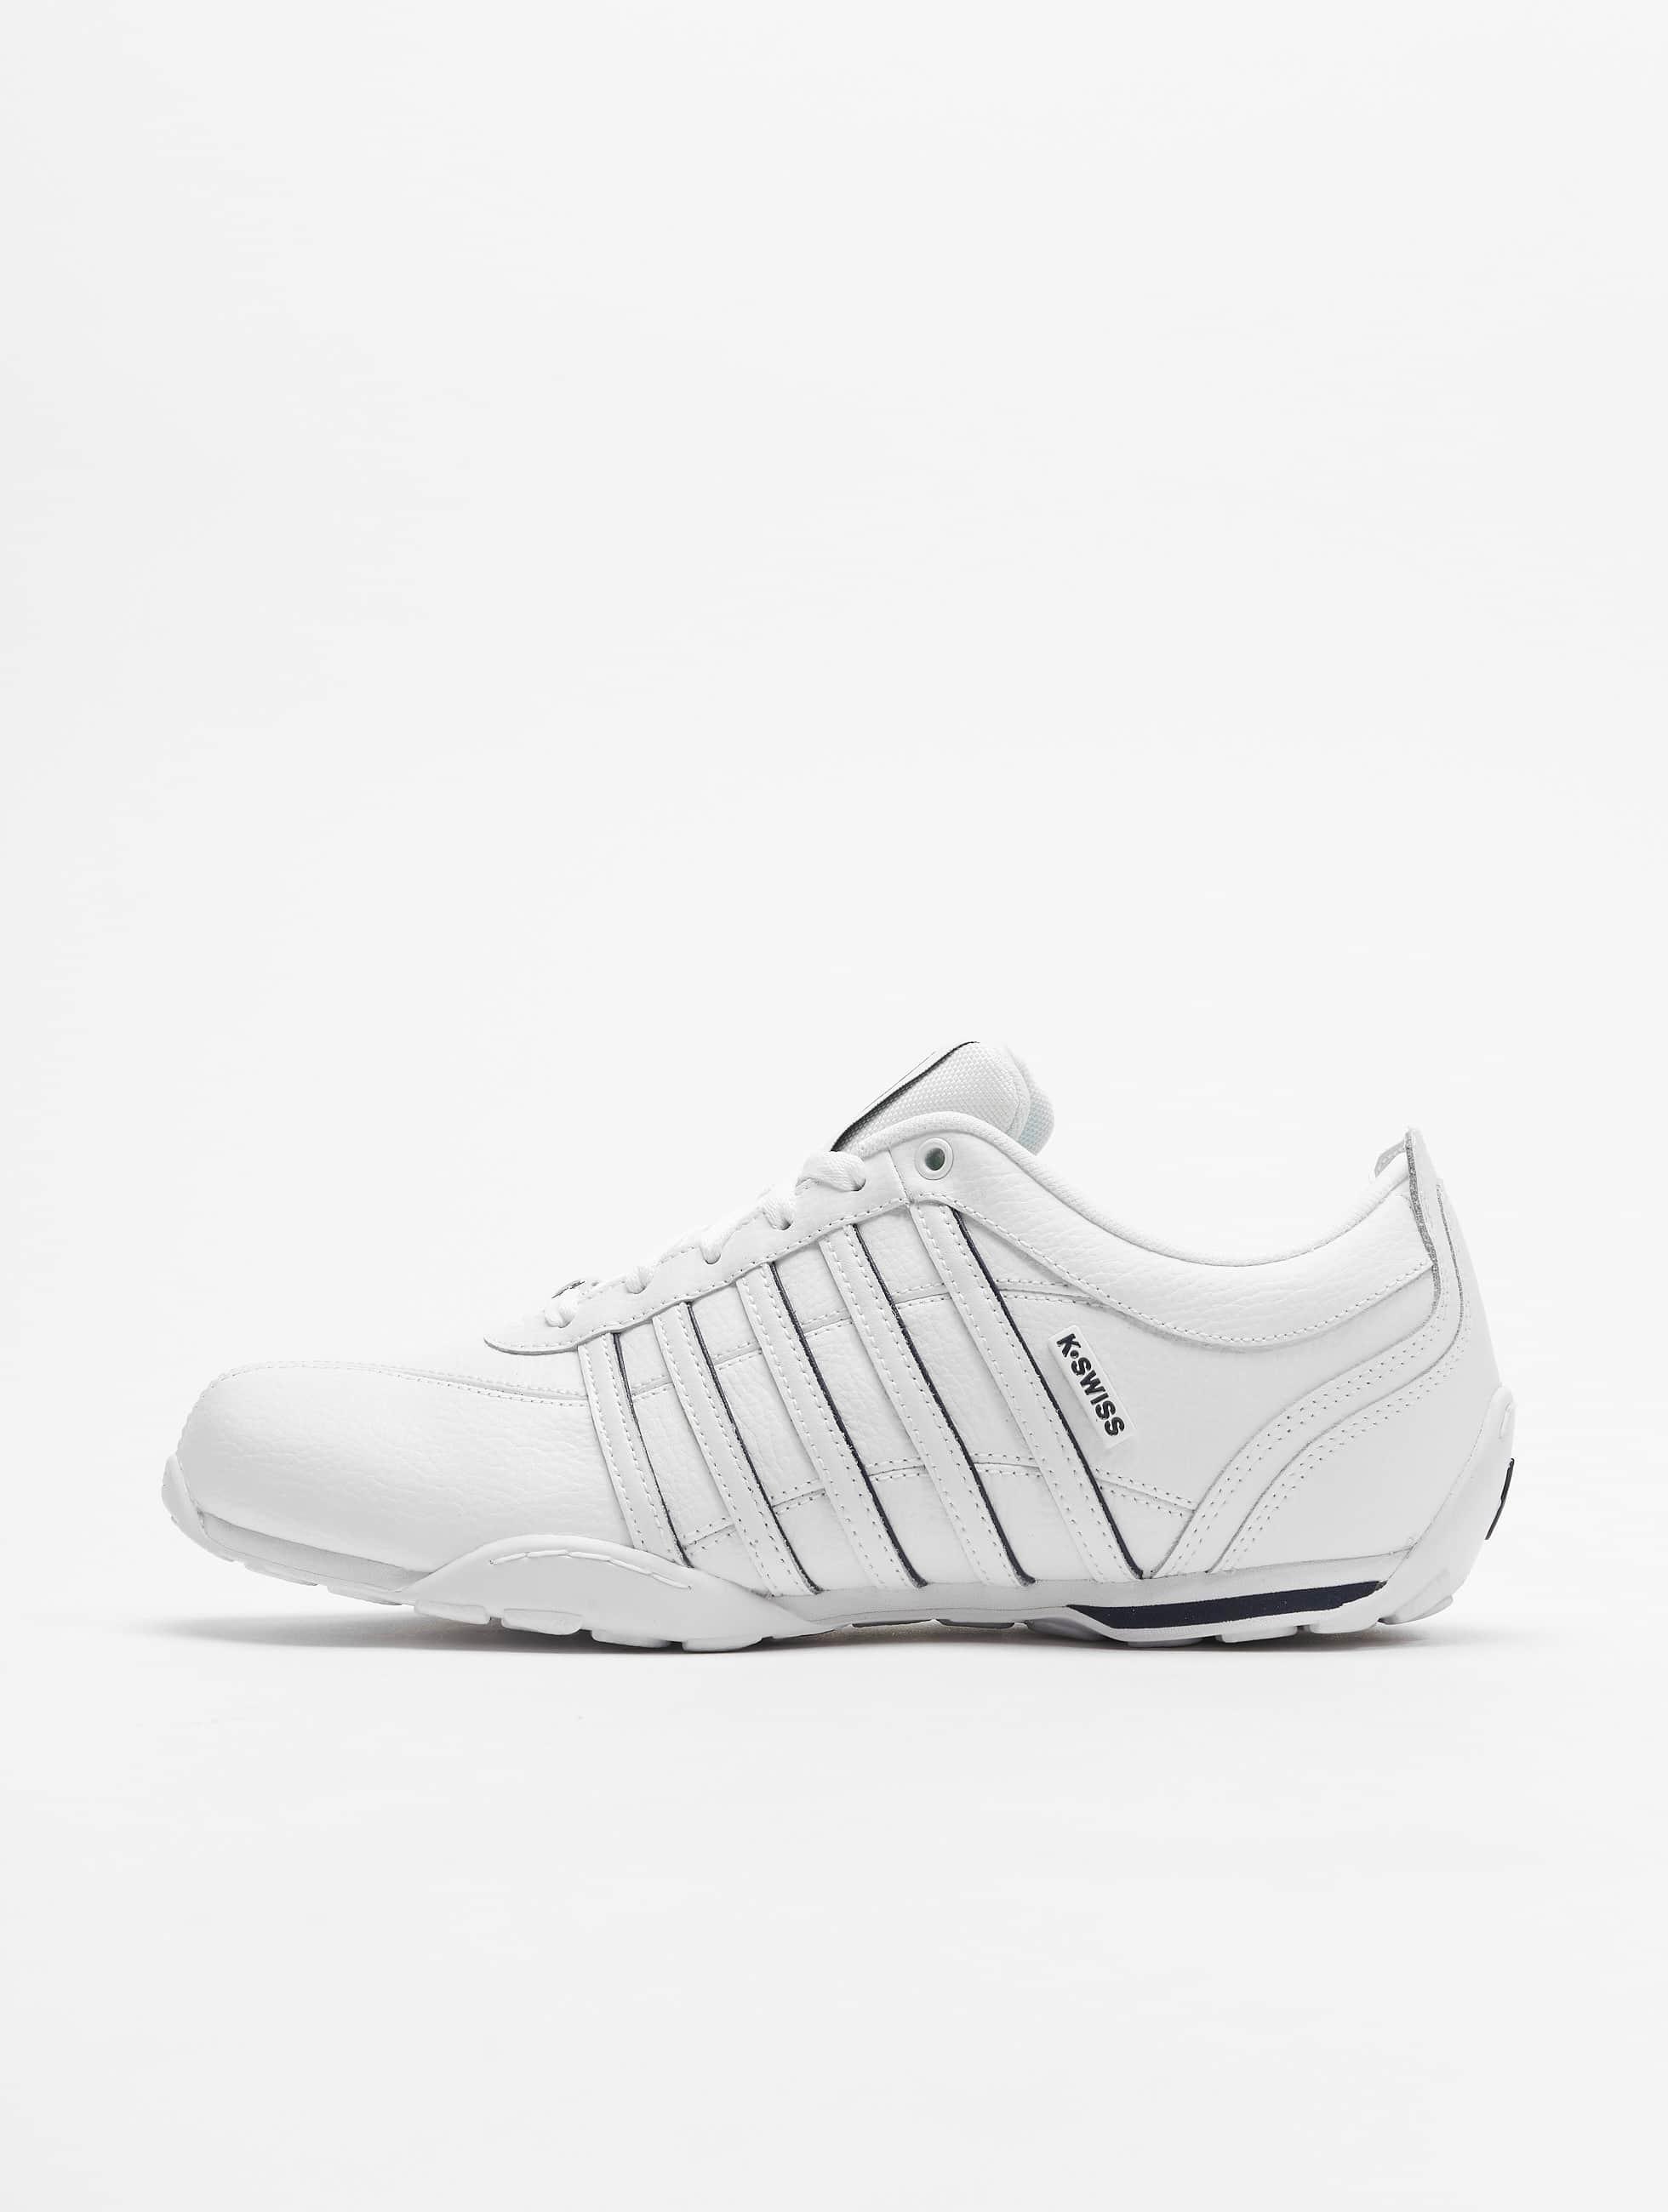 K Swiss Arvee 1.5 Sneakers WhiteWhiteNavySilvern White1